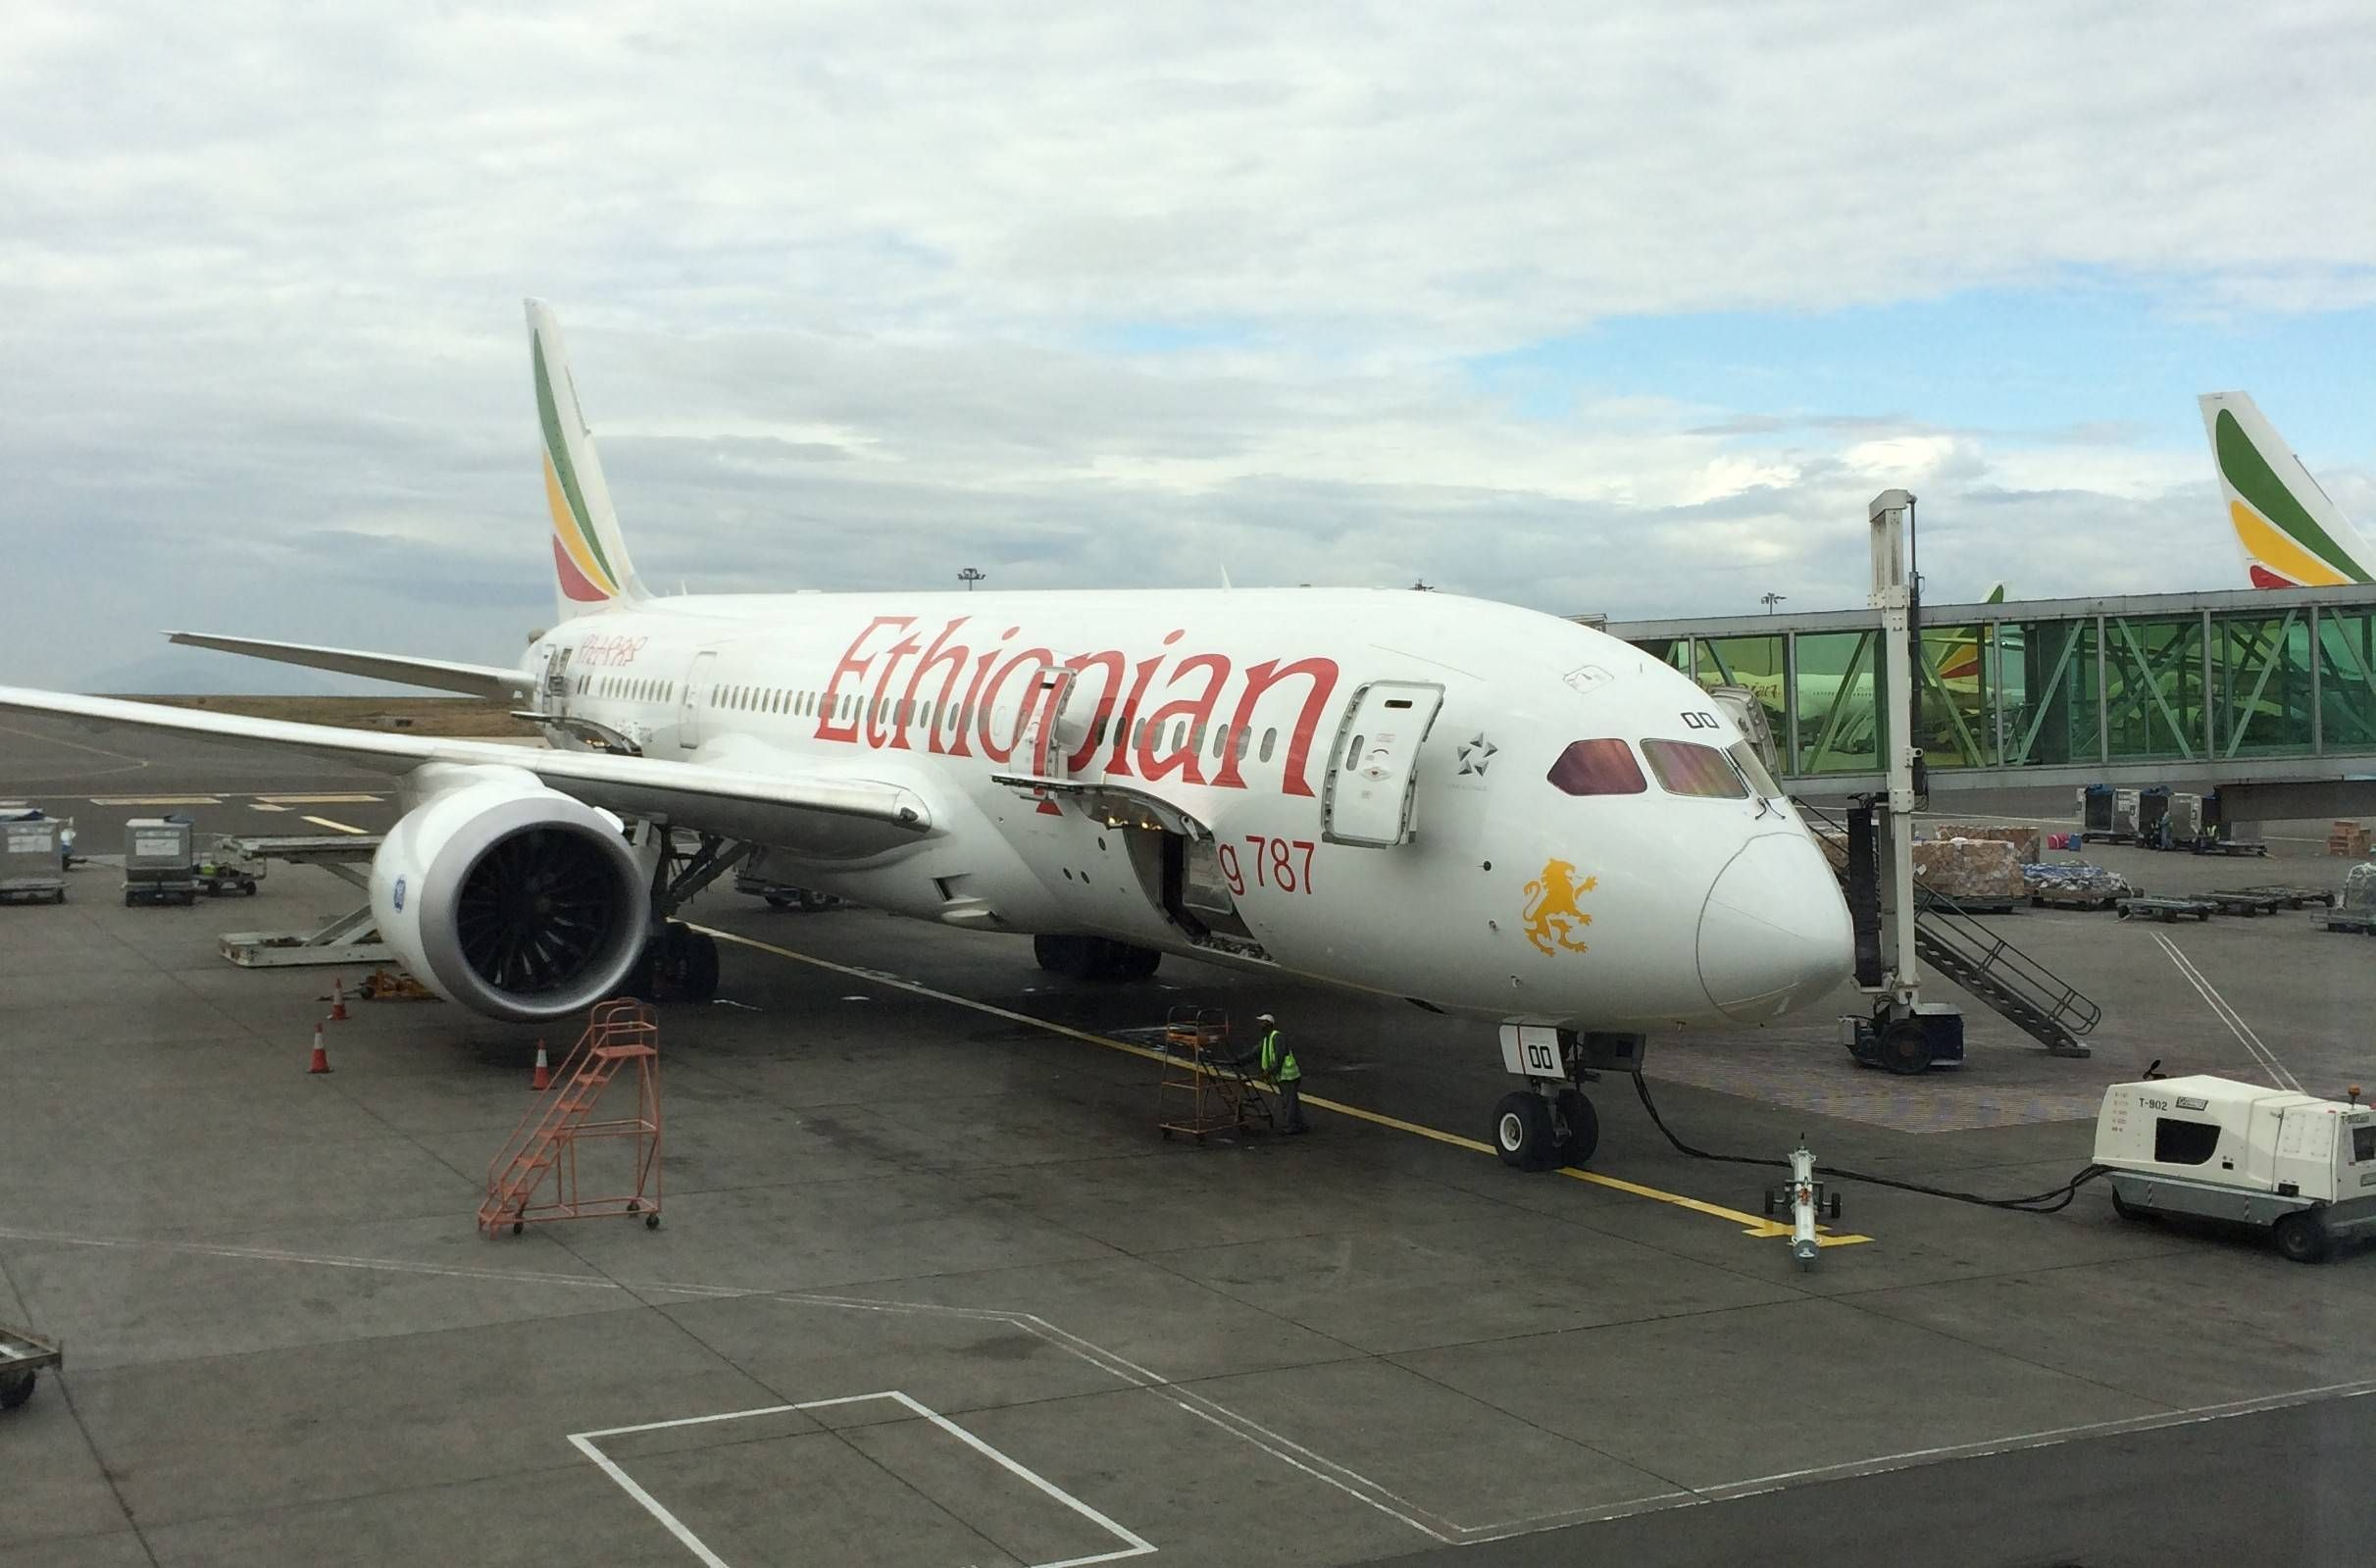 Aeroporto Etiopia : Sala vip cloud nine da ethiopian airlines no aeroporto de